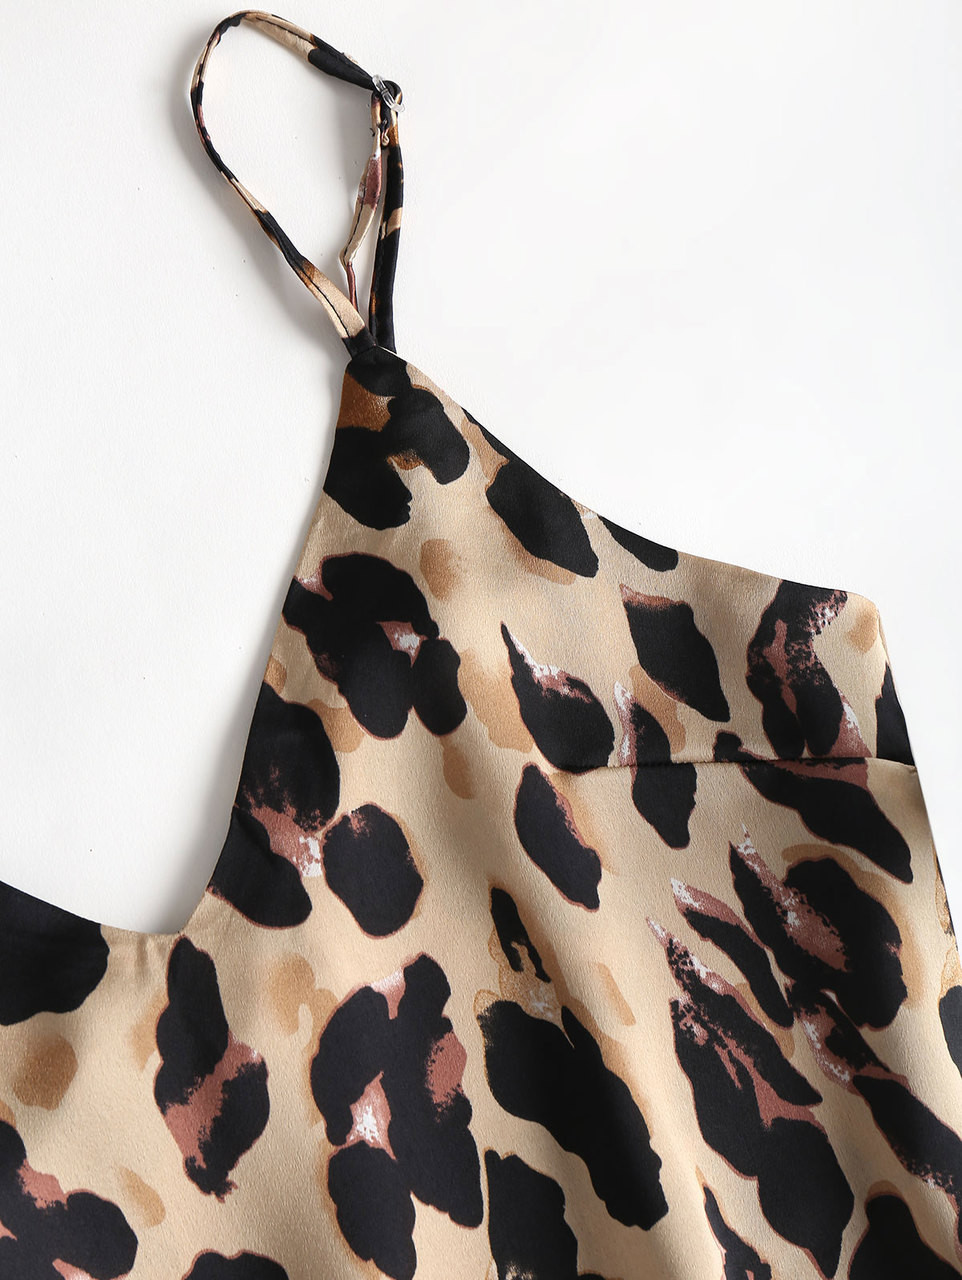 be1b181bc0 ... Wipalo Sexy Summer Pajamas Sleepwear Women Sleeveless Spaghetti Strap  Nightwear Leopard Print Satin Cami Top Shorts ...